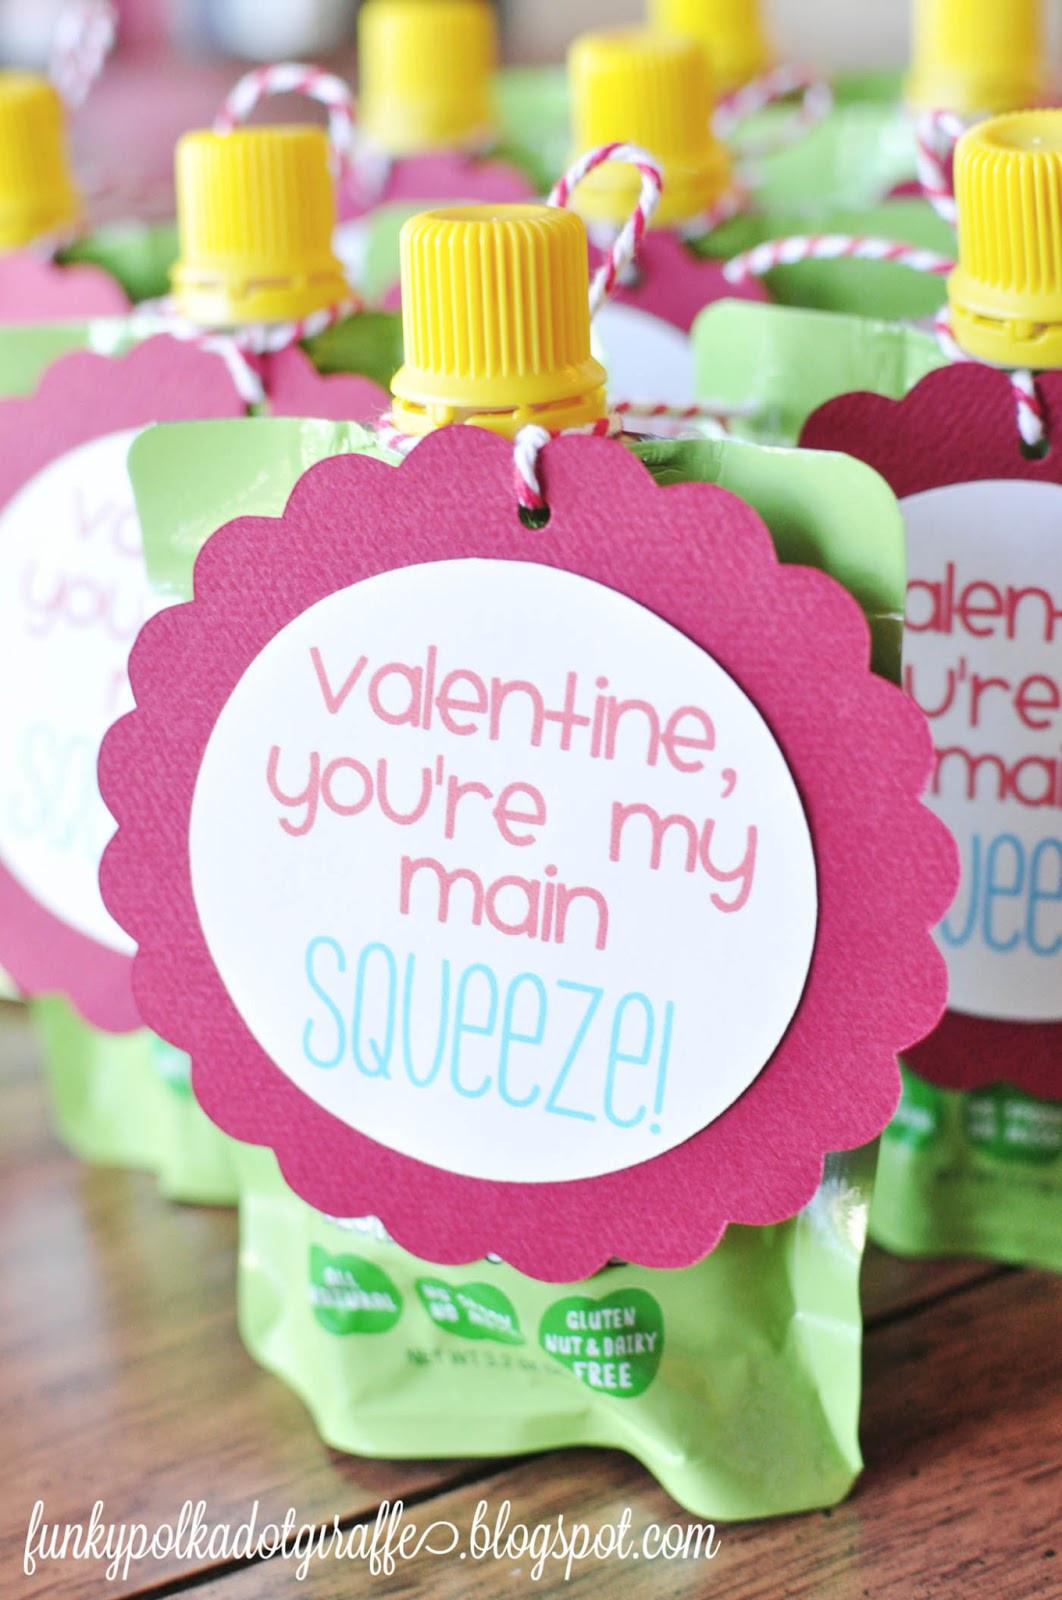 Valentine Gift Ideas For Child  Funky Polkadot Giraffe Preschool Valentines You re My